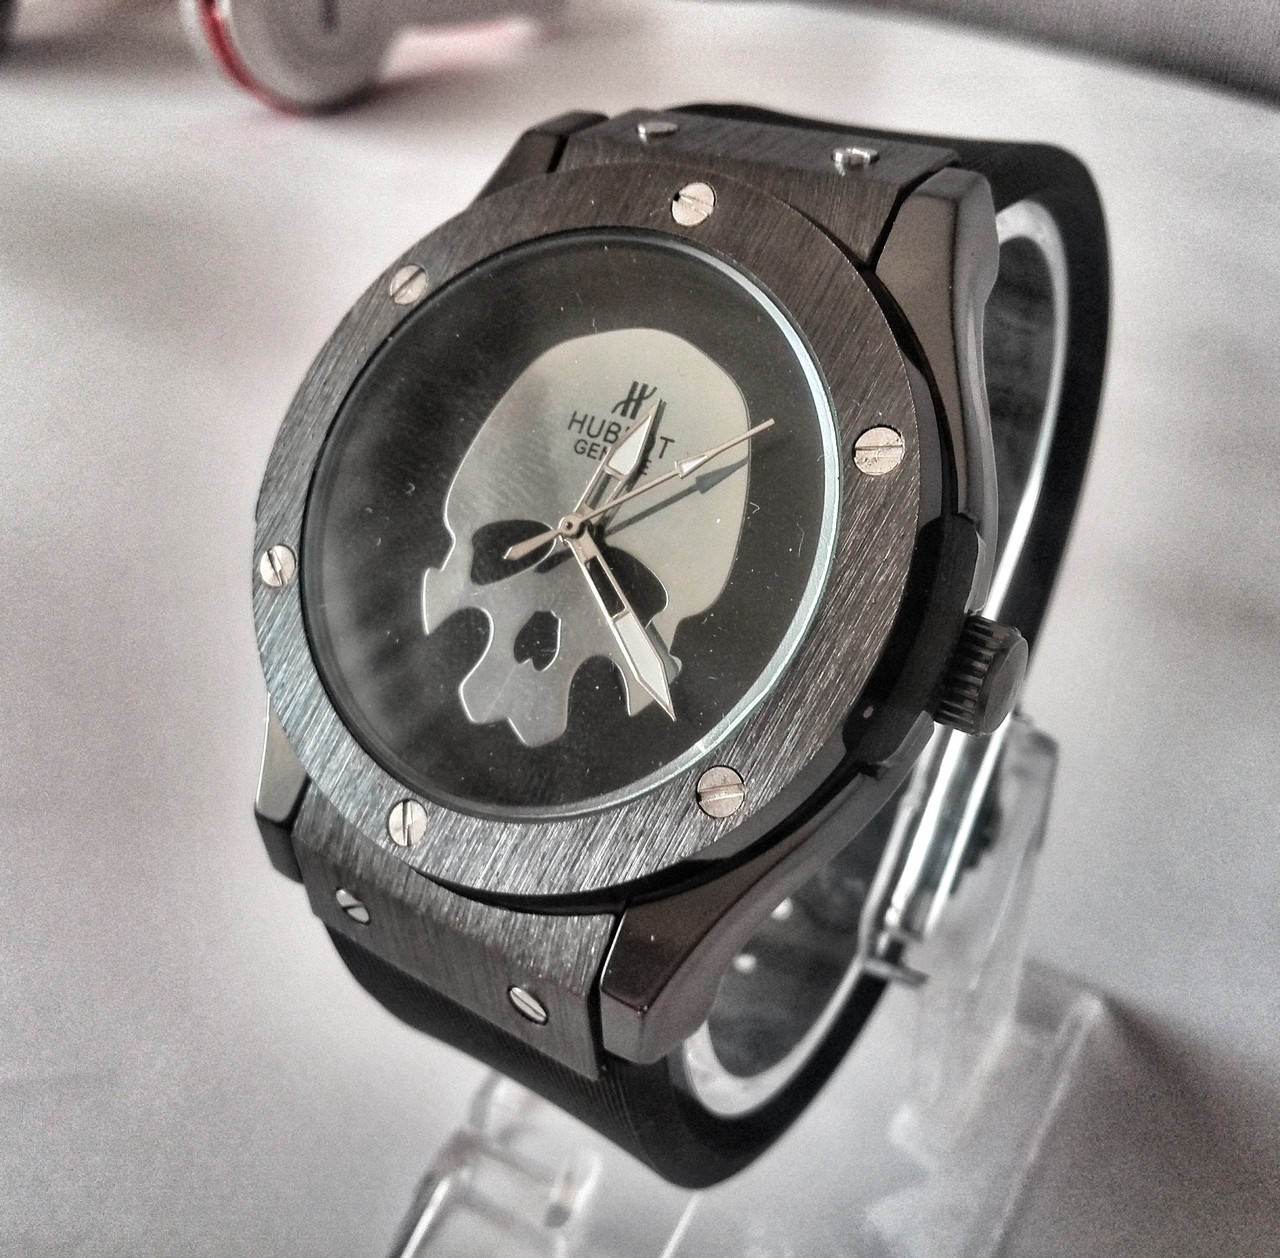 Мужские часы Hublot Skull Bang (replica) - Интернет магазин Ocloc k в Киеве e81014becf77a